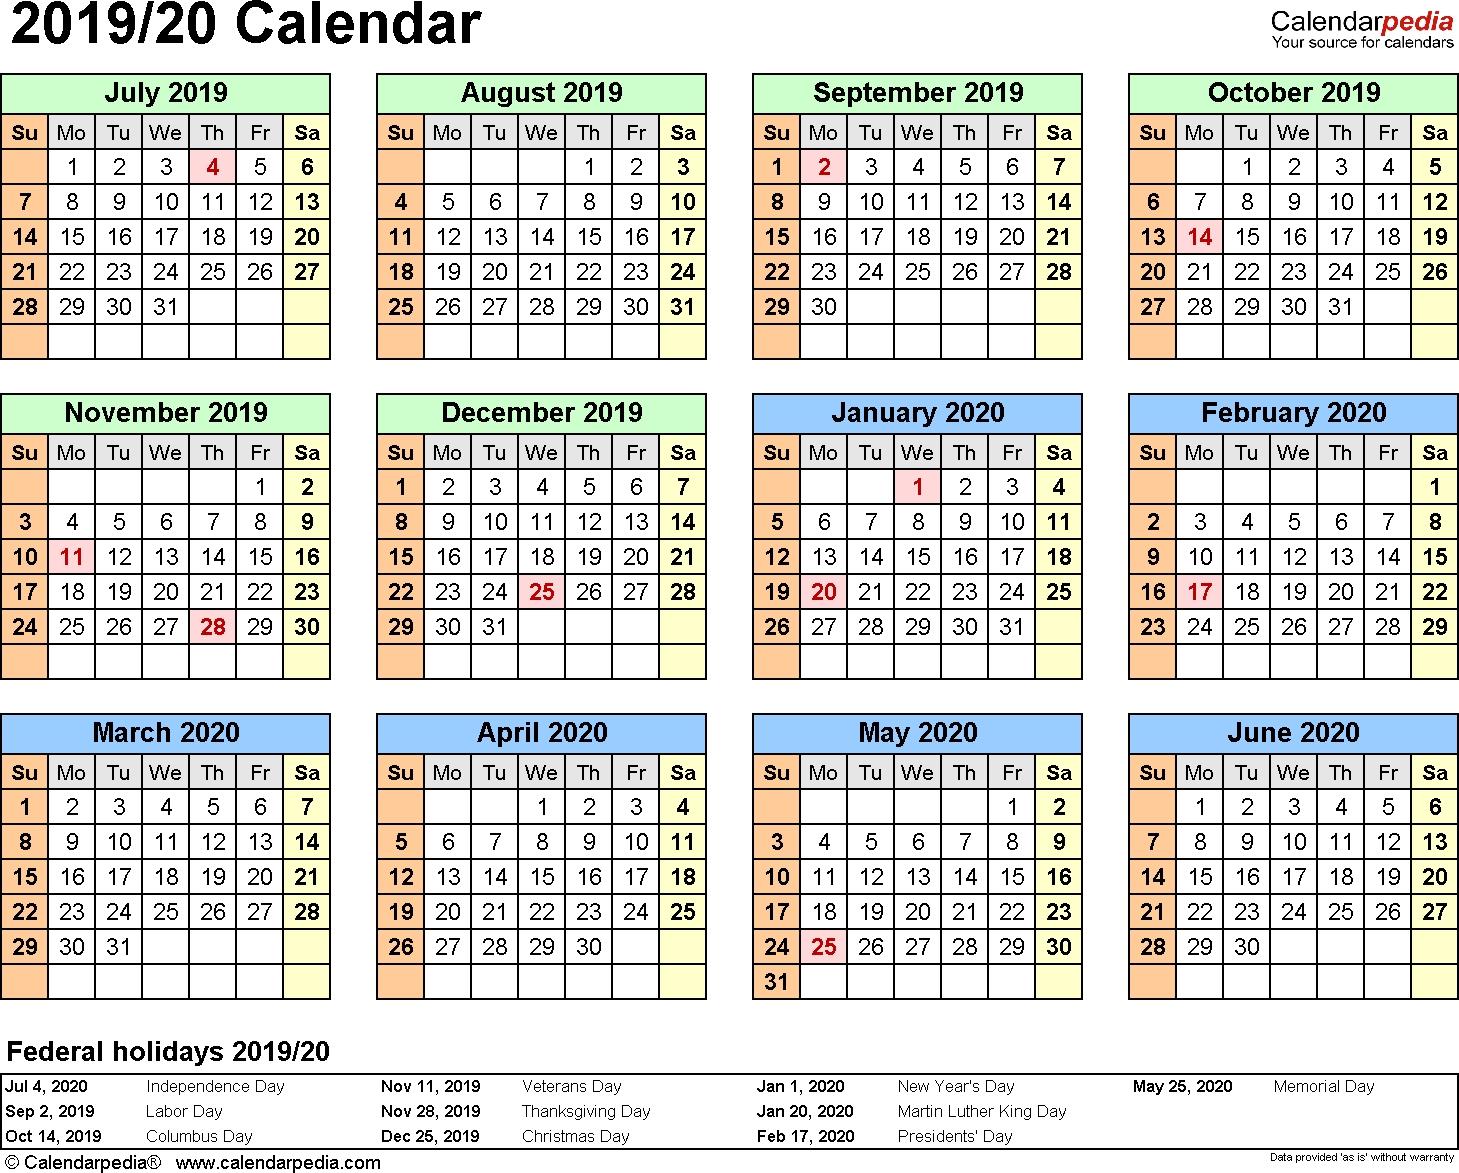 Split Year Calendar 2019/20 (July To June) - Word Templates inside Pritnable 5 Day Calendar 2019-2020